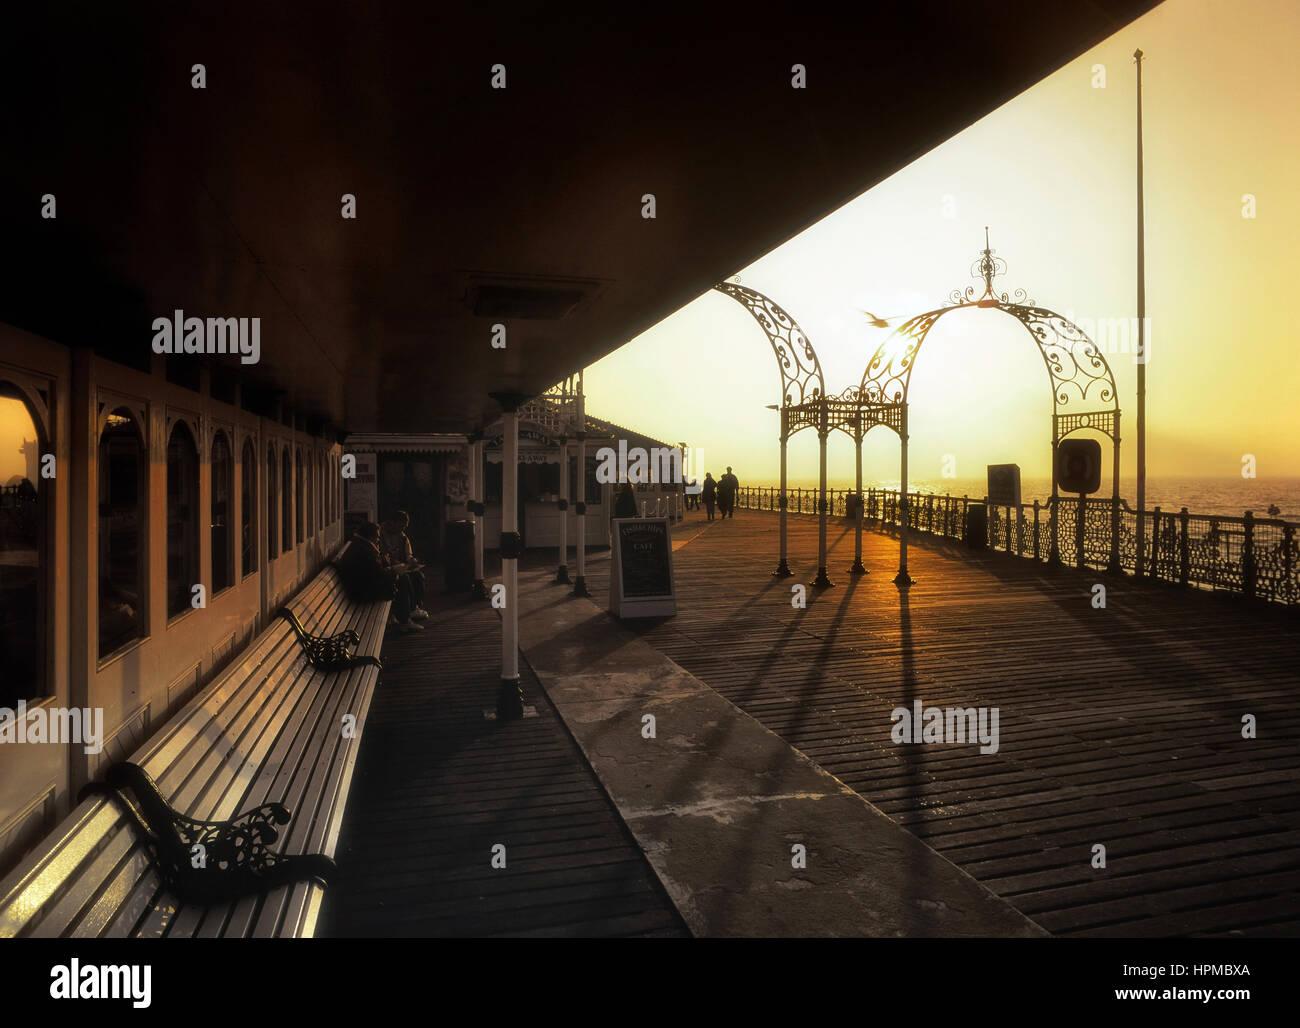 Palace pier. Brighton. Sussex. England. UK - Stock Image